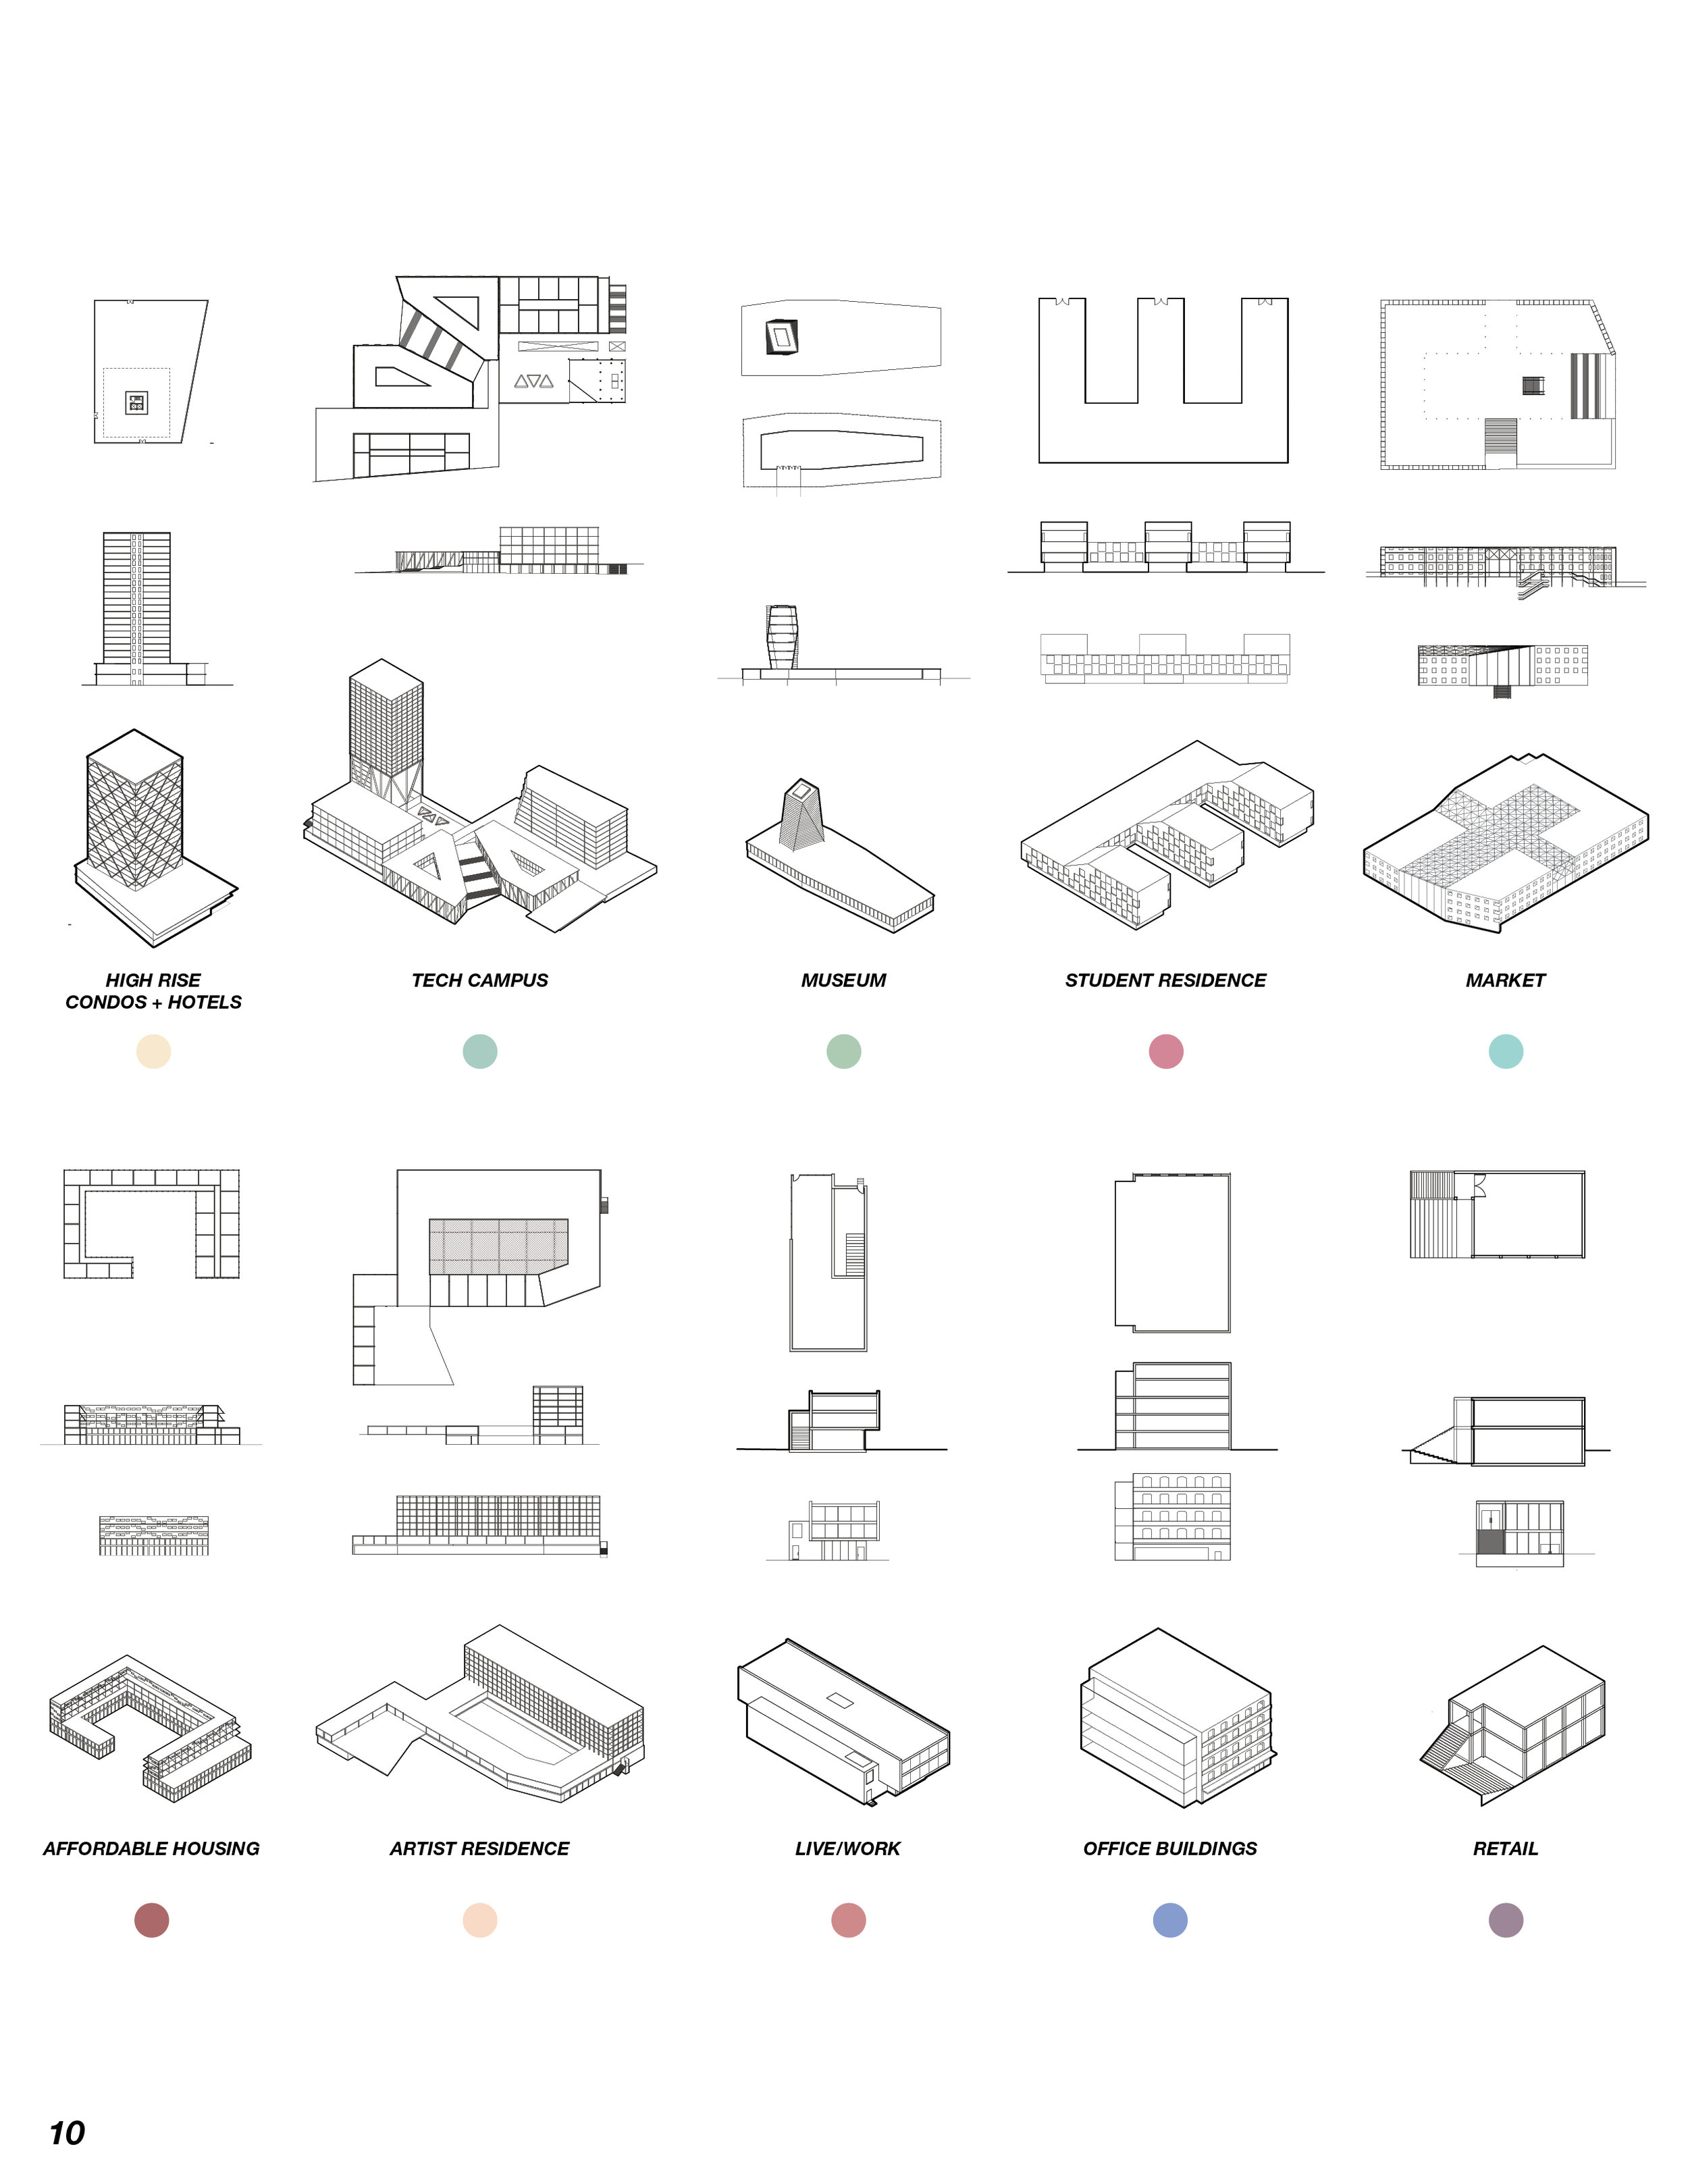 Building Typologies axo.jpg